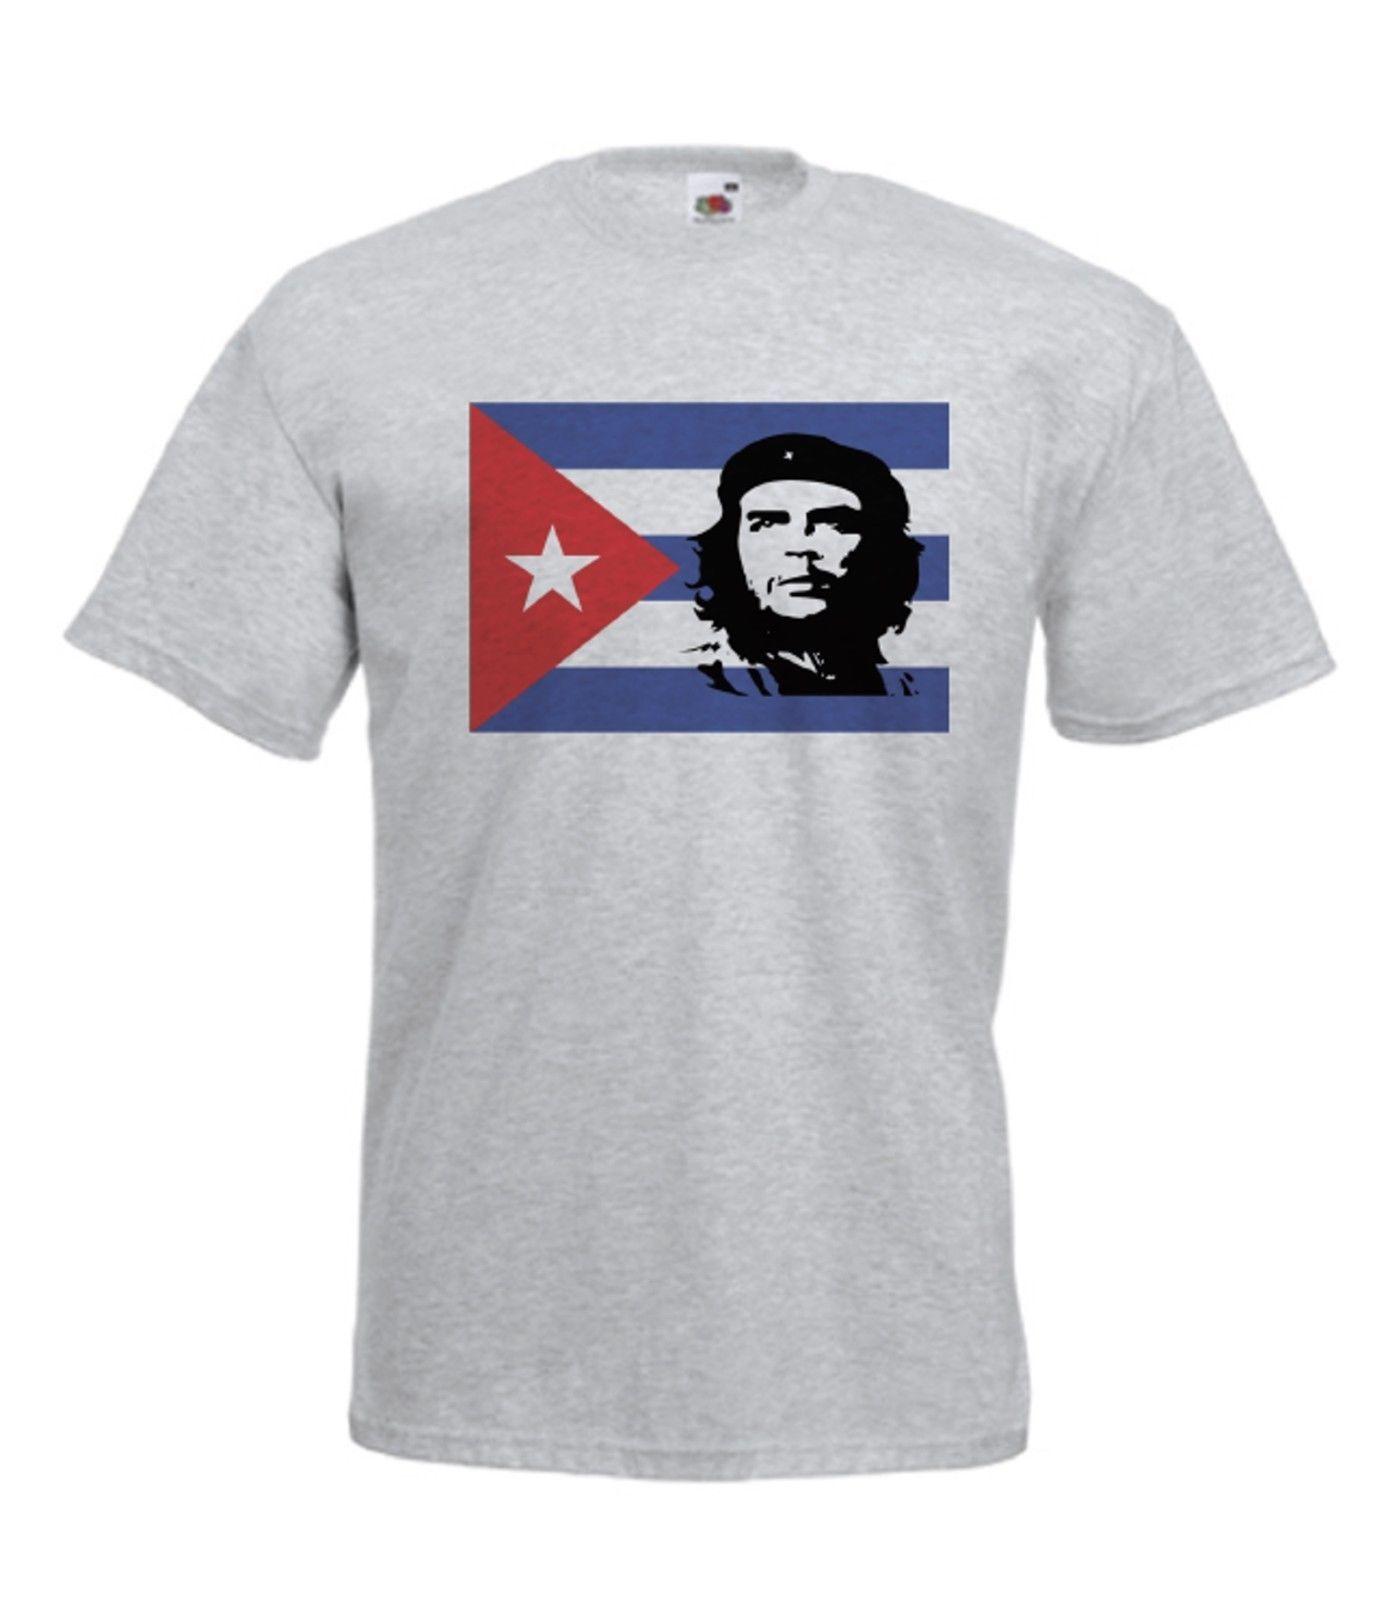 03ca3f554 CHE GUEVARA CUBA NEW Gift Men Women T SHIRTS TOP Funny Casual Tee R Shirt  Political Tee Shirts From Fatcuckoo, $12.96| DHgate.Com